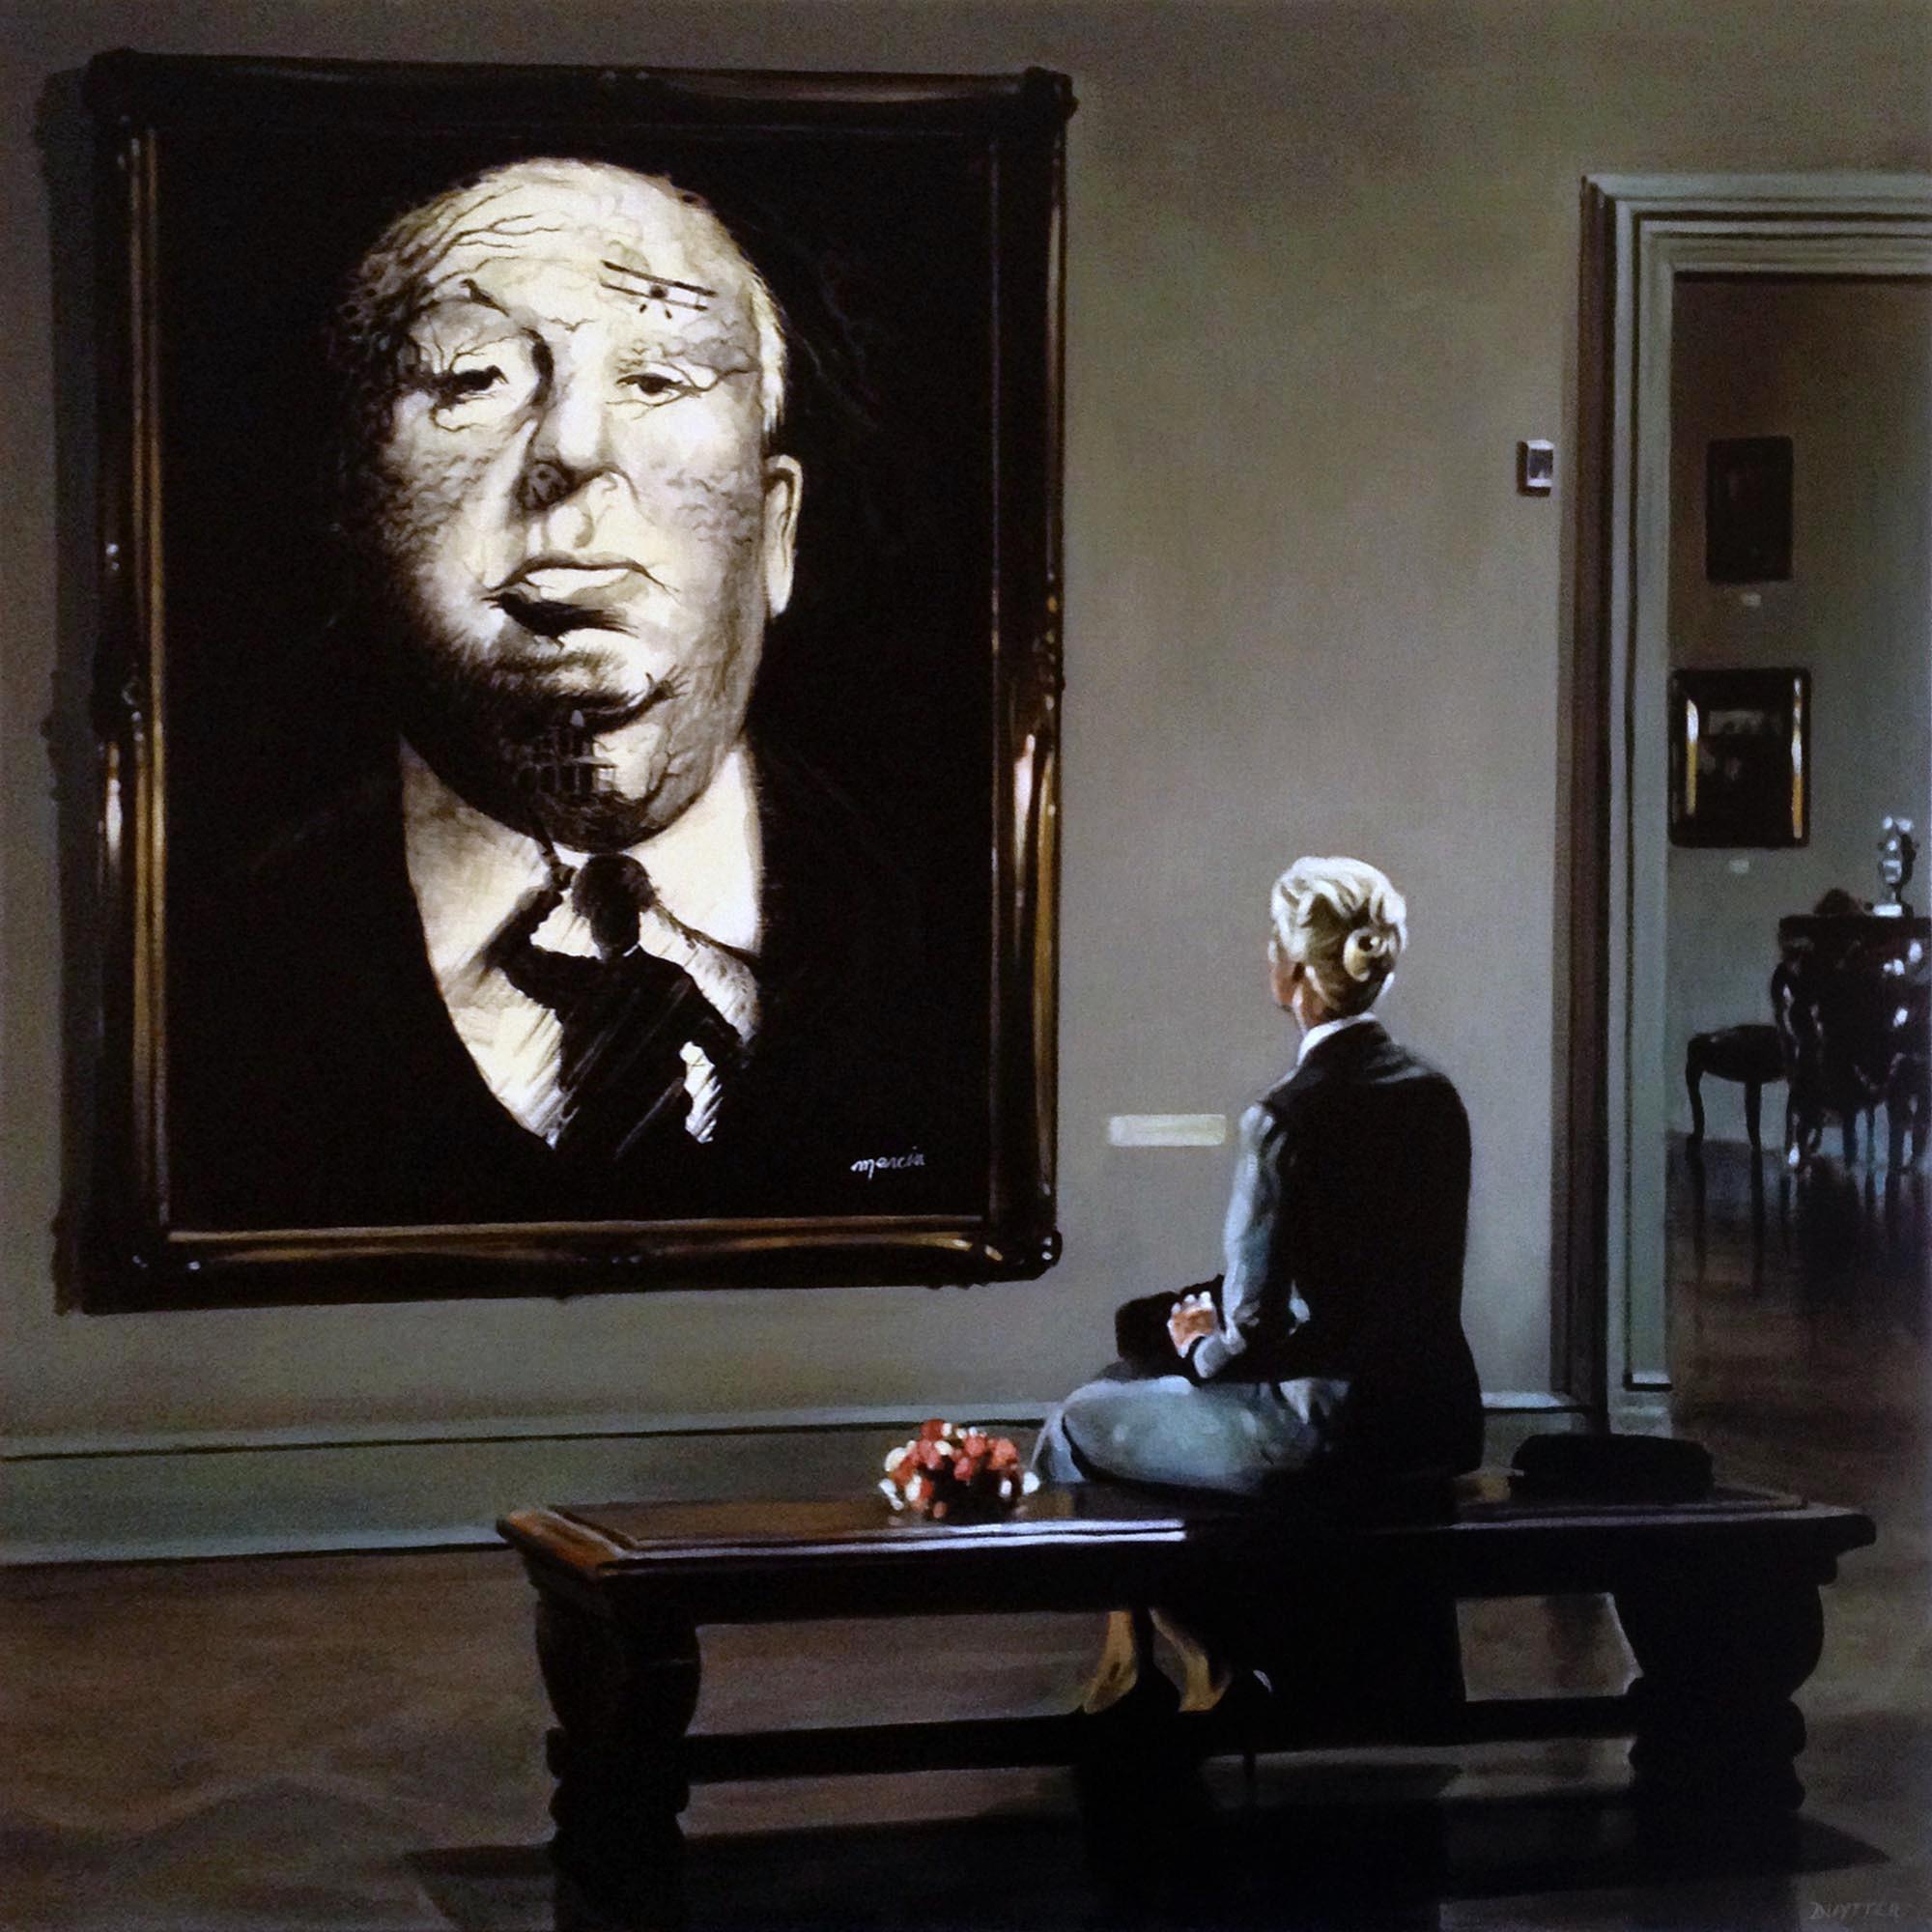 Hommage à Alfred Hitchcock, 4 mains avec